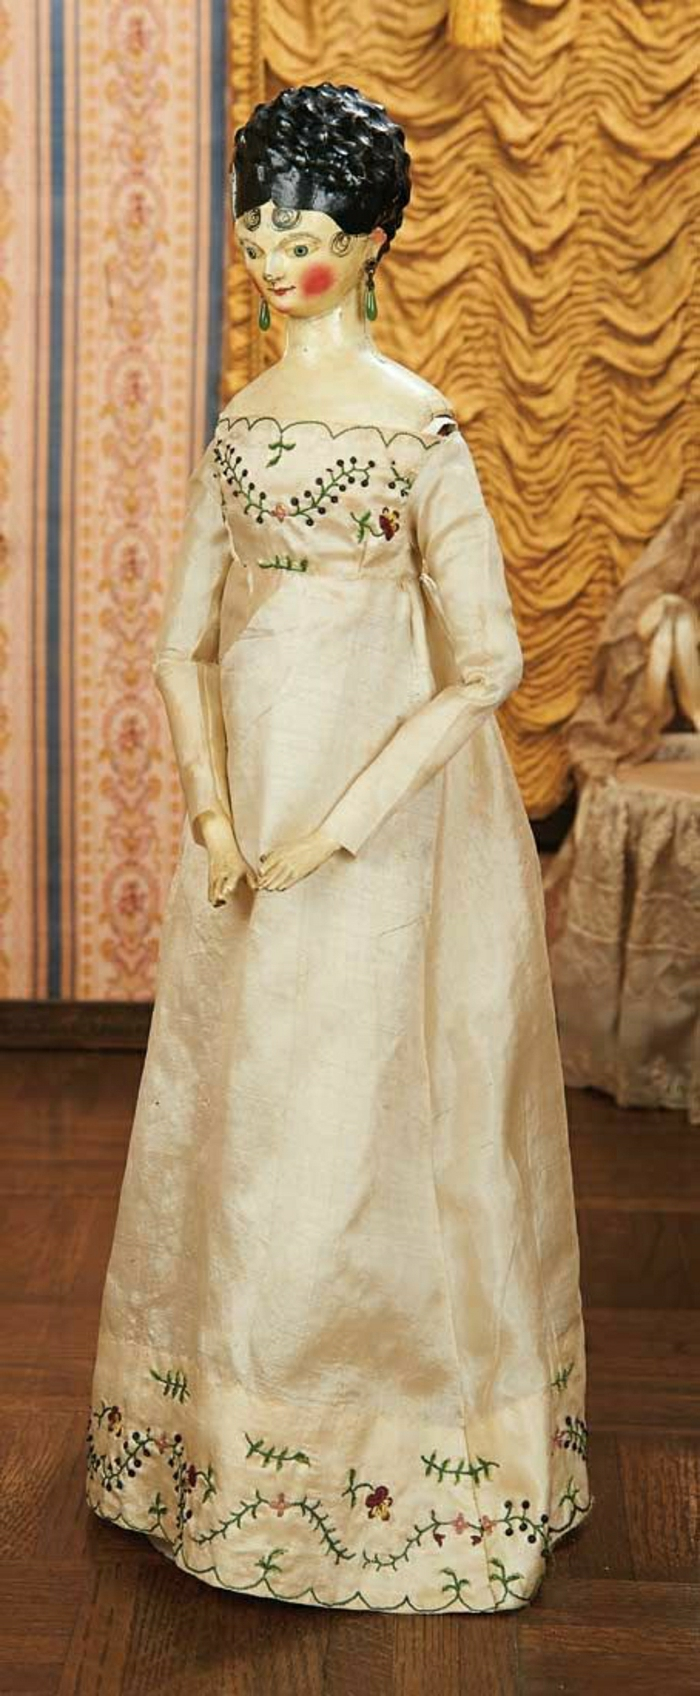 alte-Puppen-gegen-1800-Damen-langes-Kleid-Seide